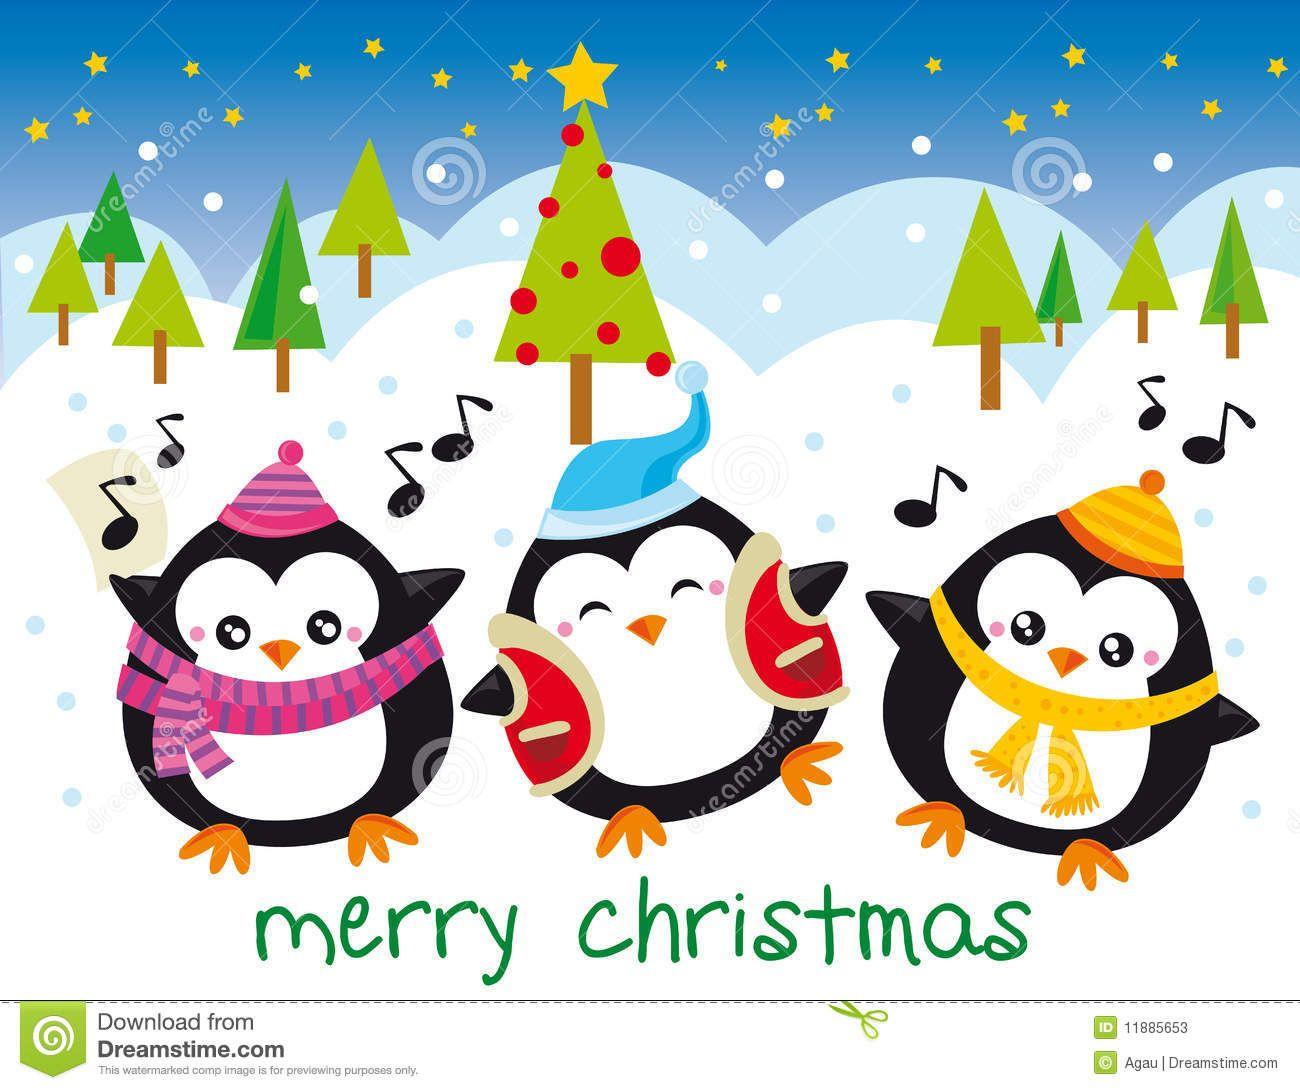 Download Christmas Penguins Cartoon Vector via CartoonDealer